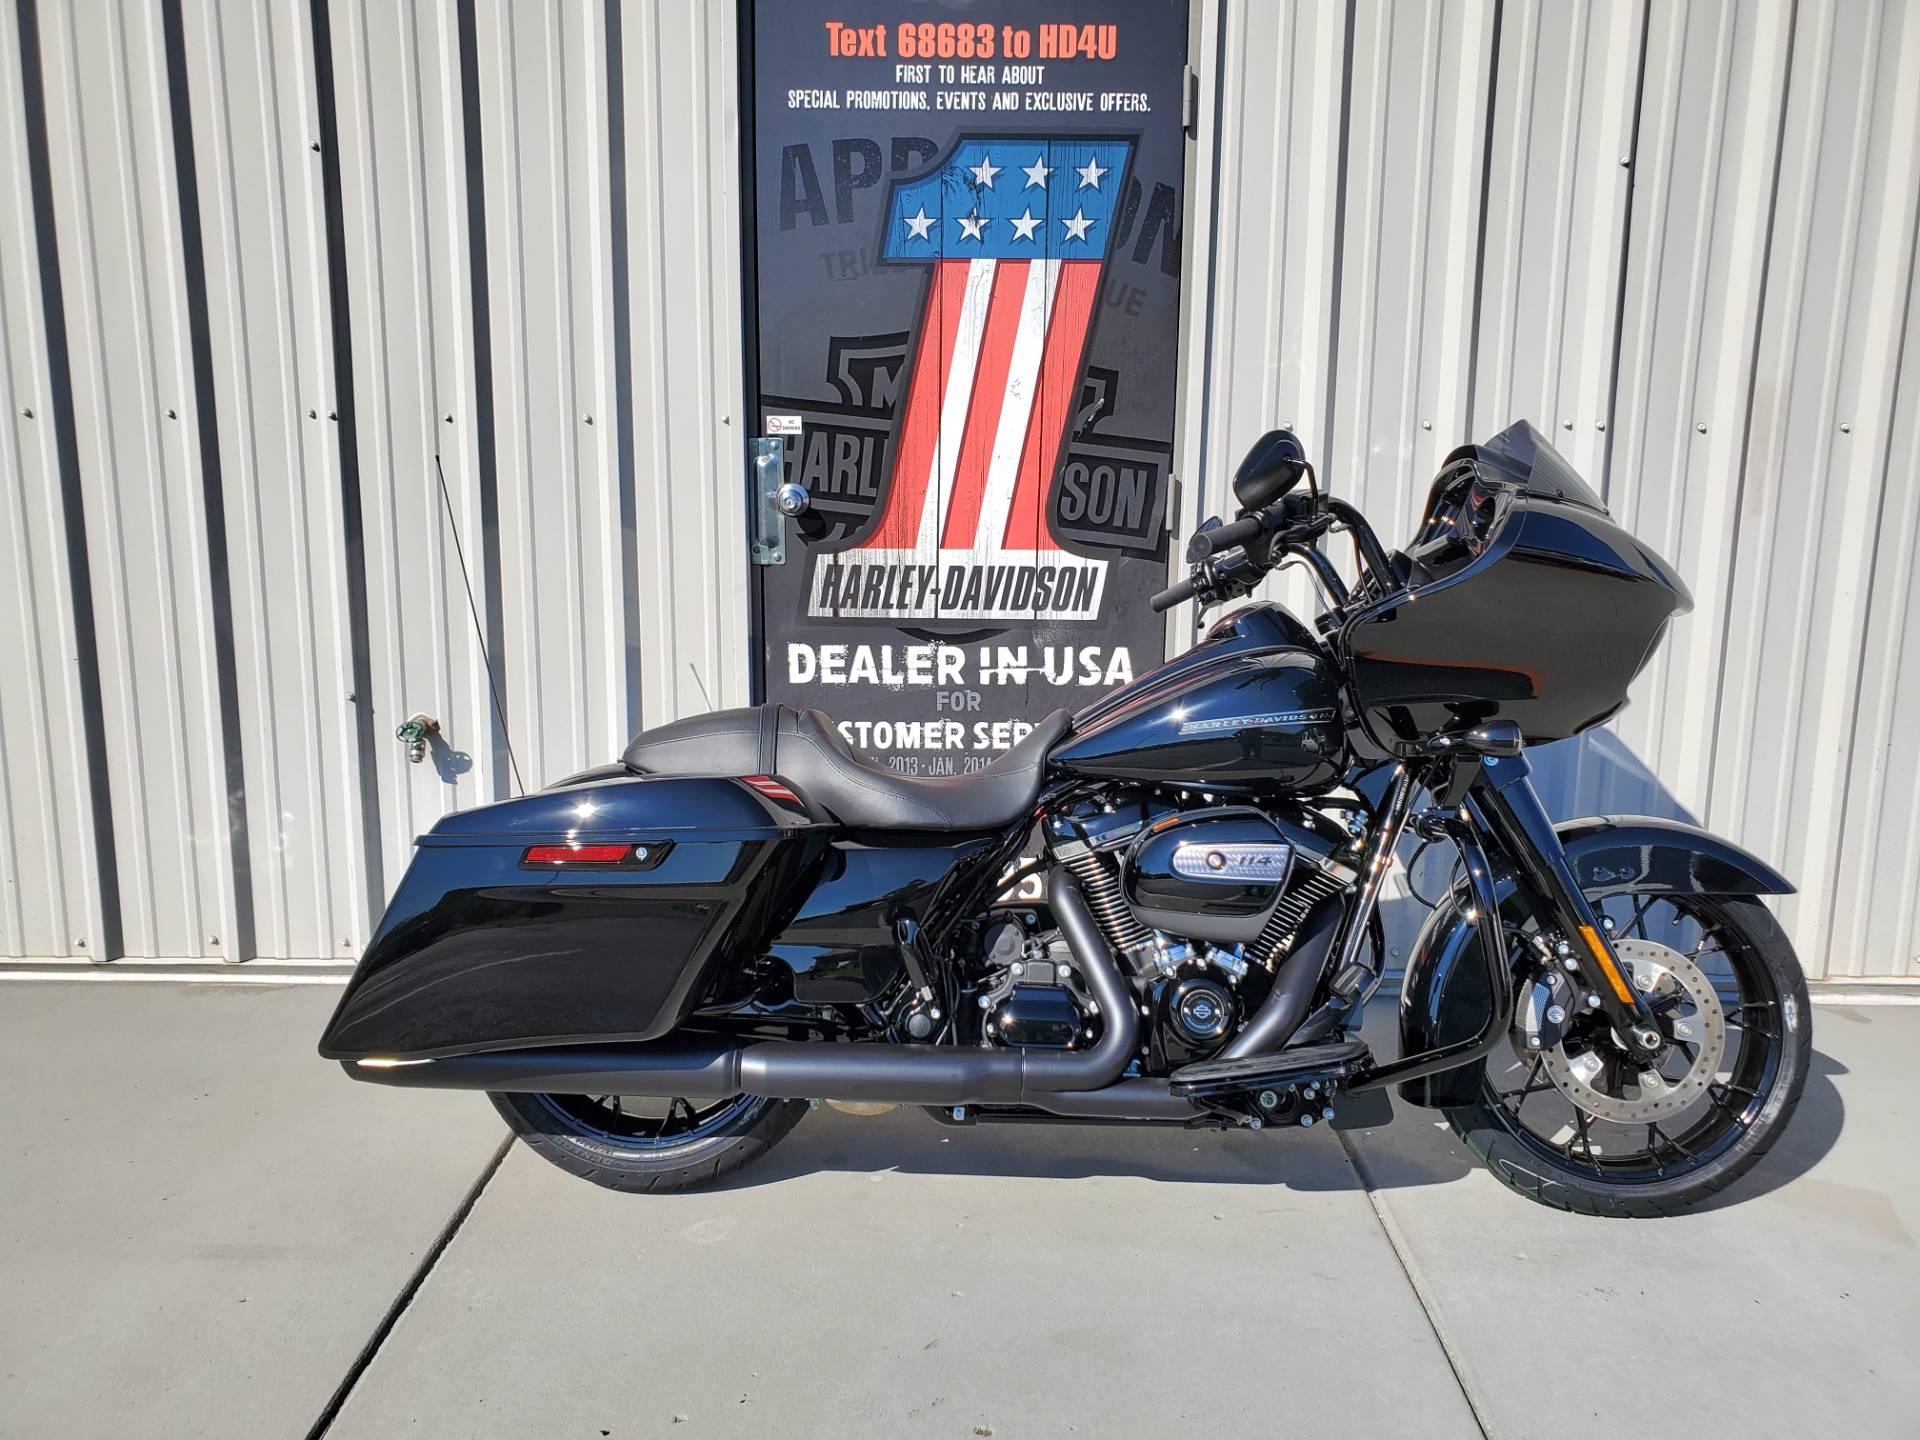 New 2020 Harley Davidson Road Glide Special Motorcycles In Clarksville Tn Nmu655197 Vivid Black